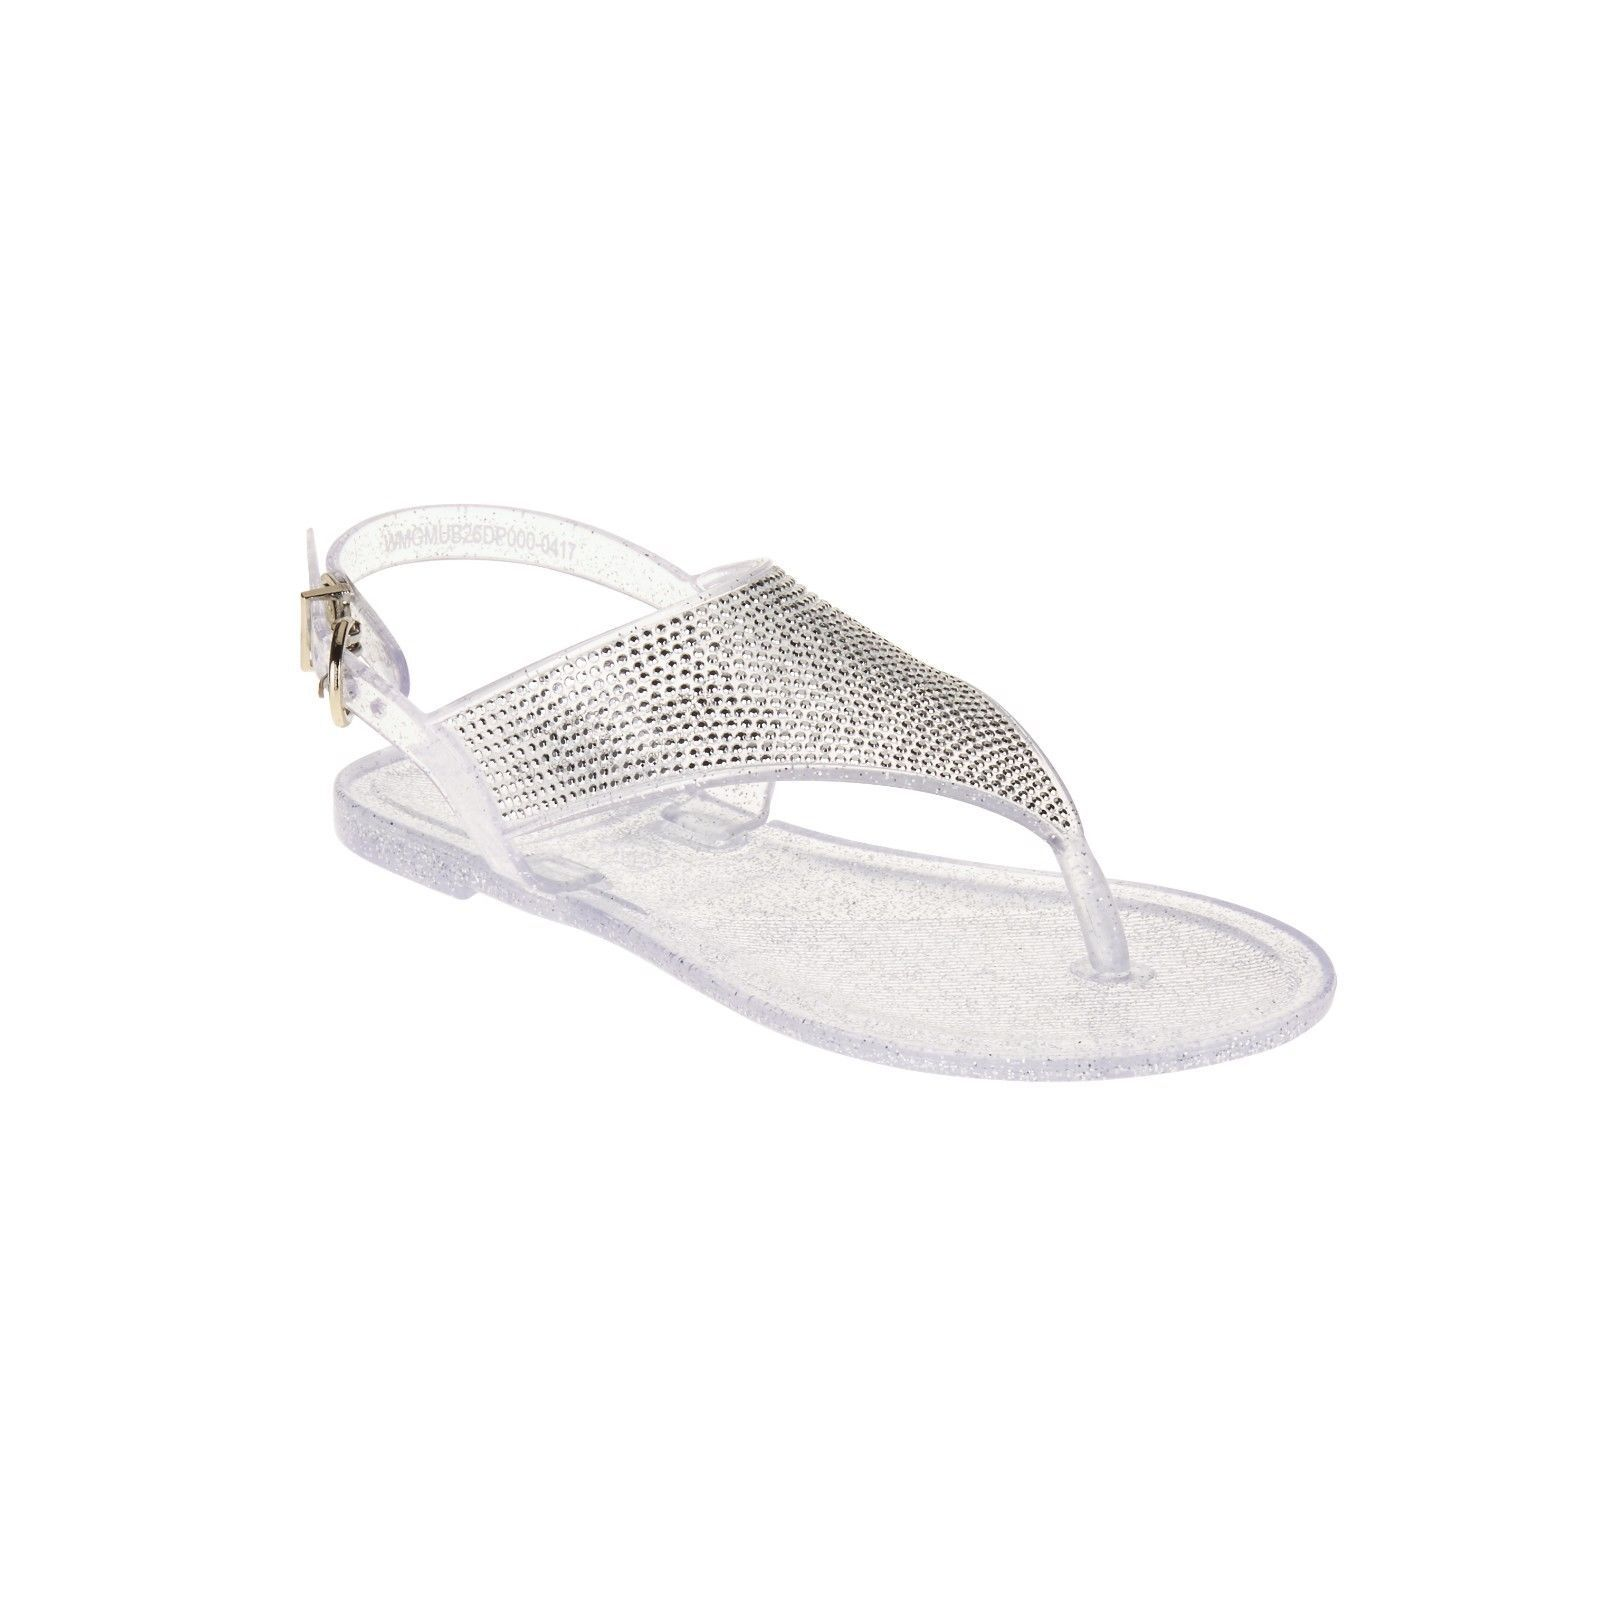 666f98c6a Girls Rhinestone Jelly Sandal Clear Glitter and 50 similar items. 57